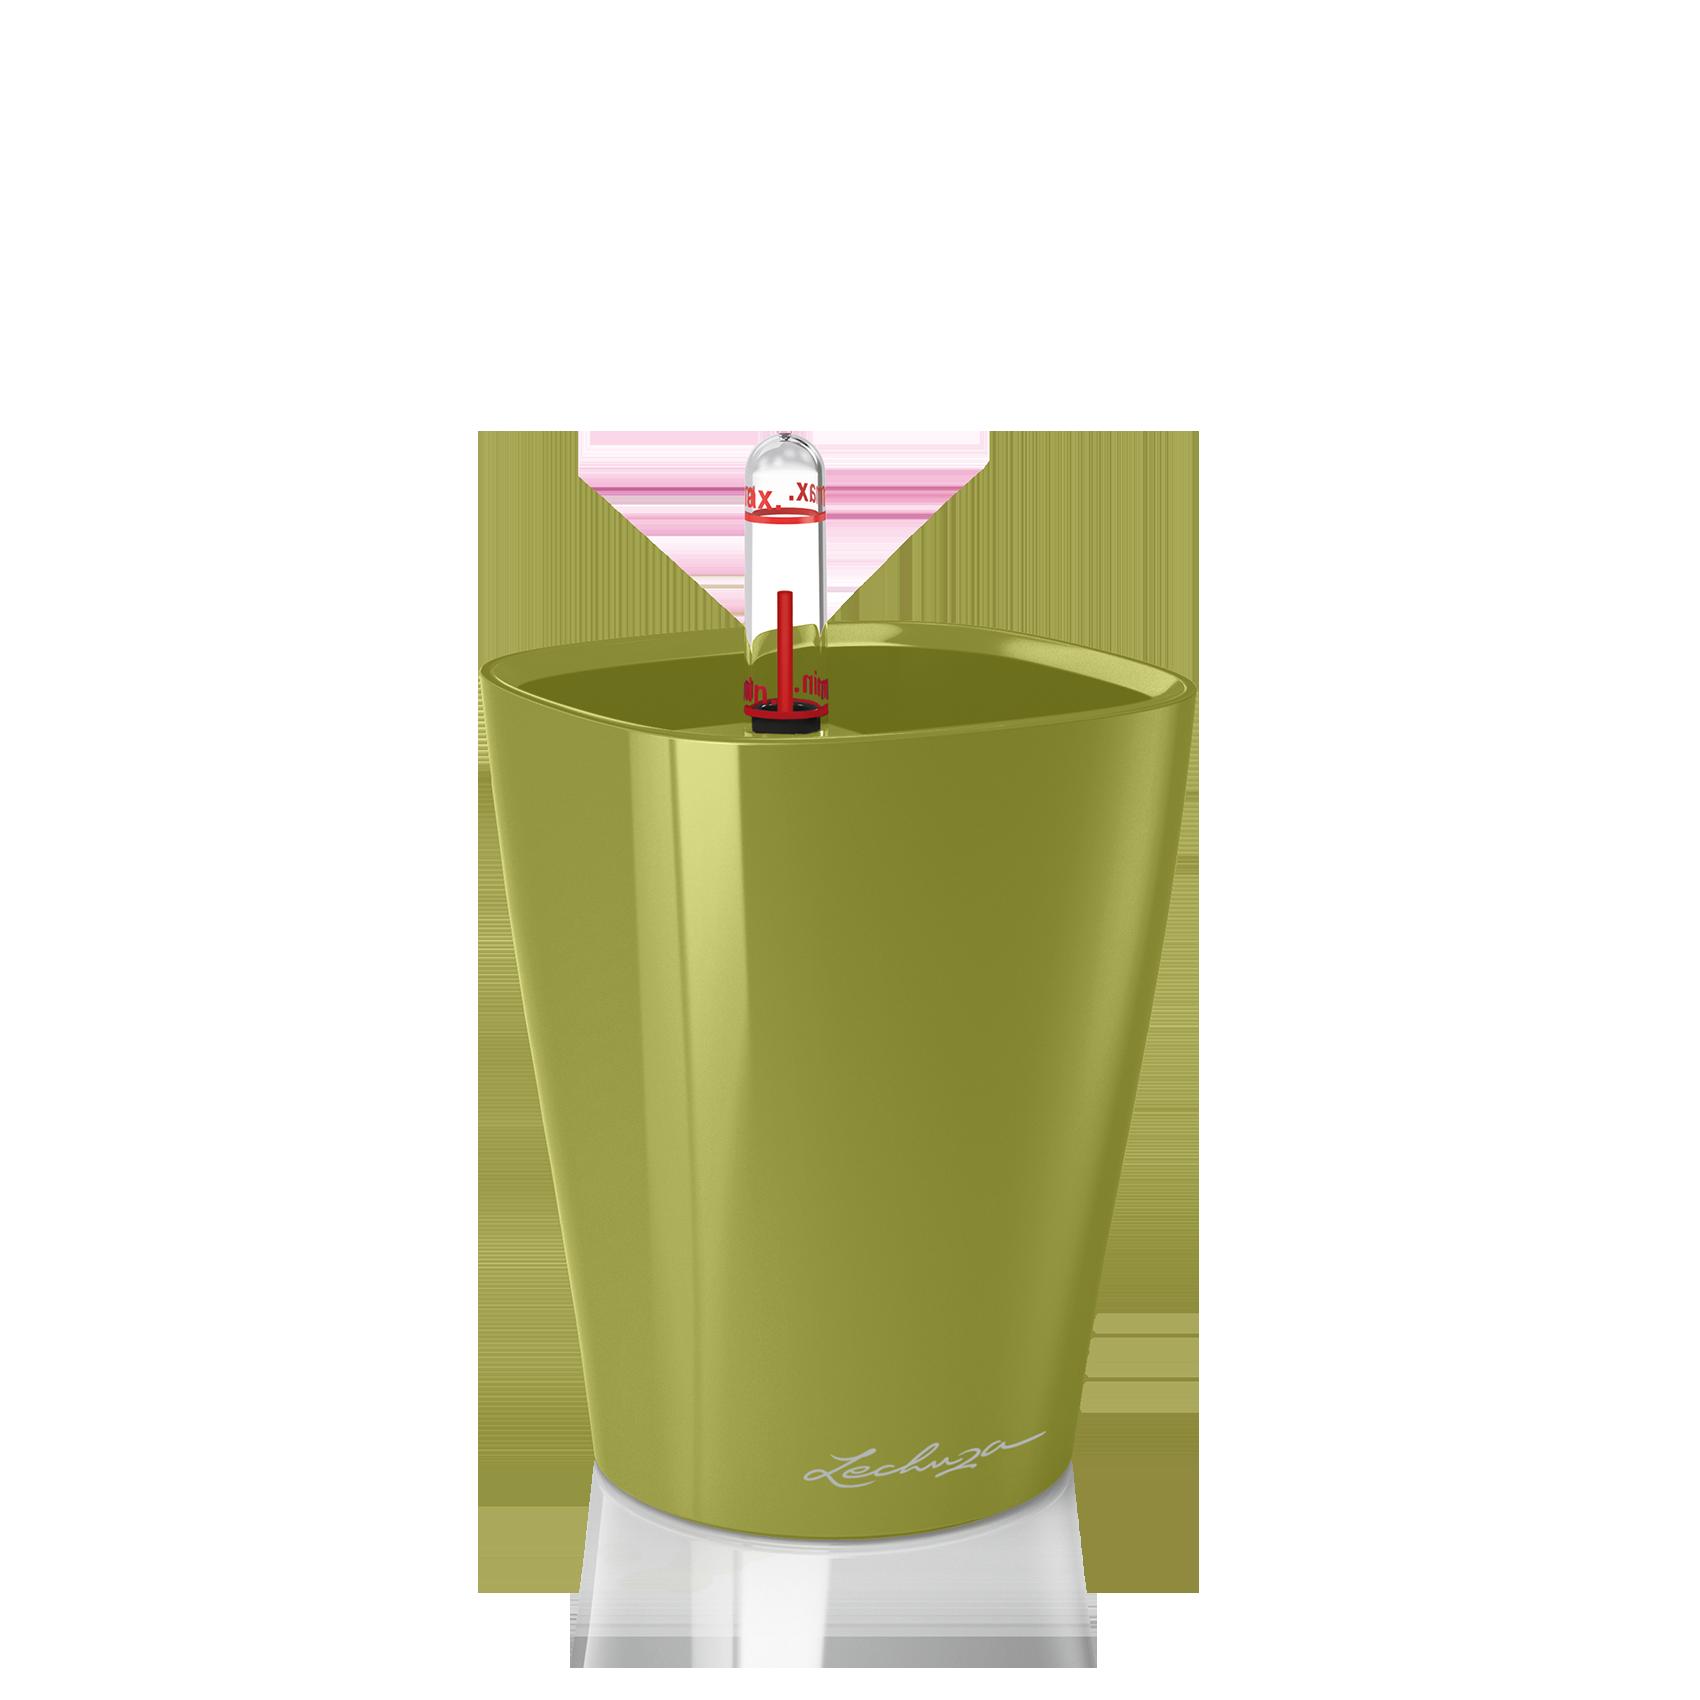 MINI-DELTINI olive green high-gloss